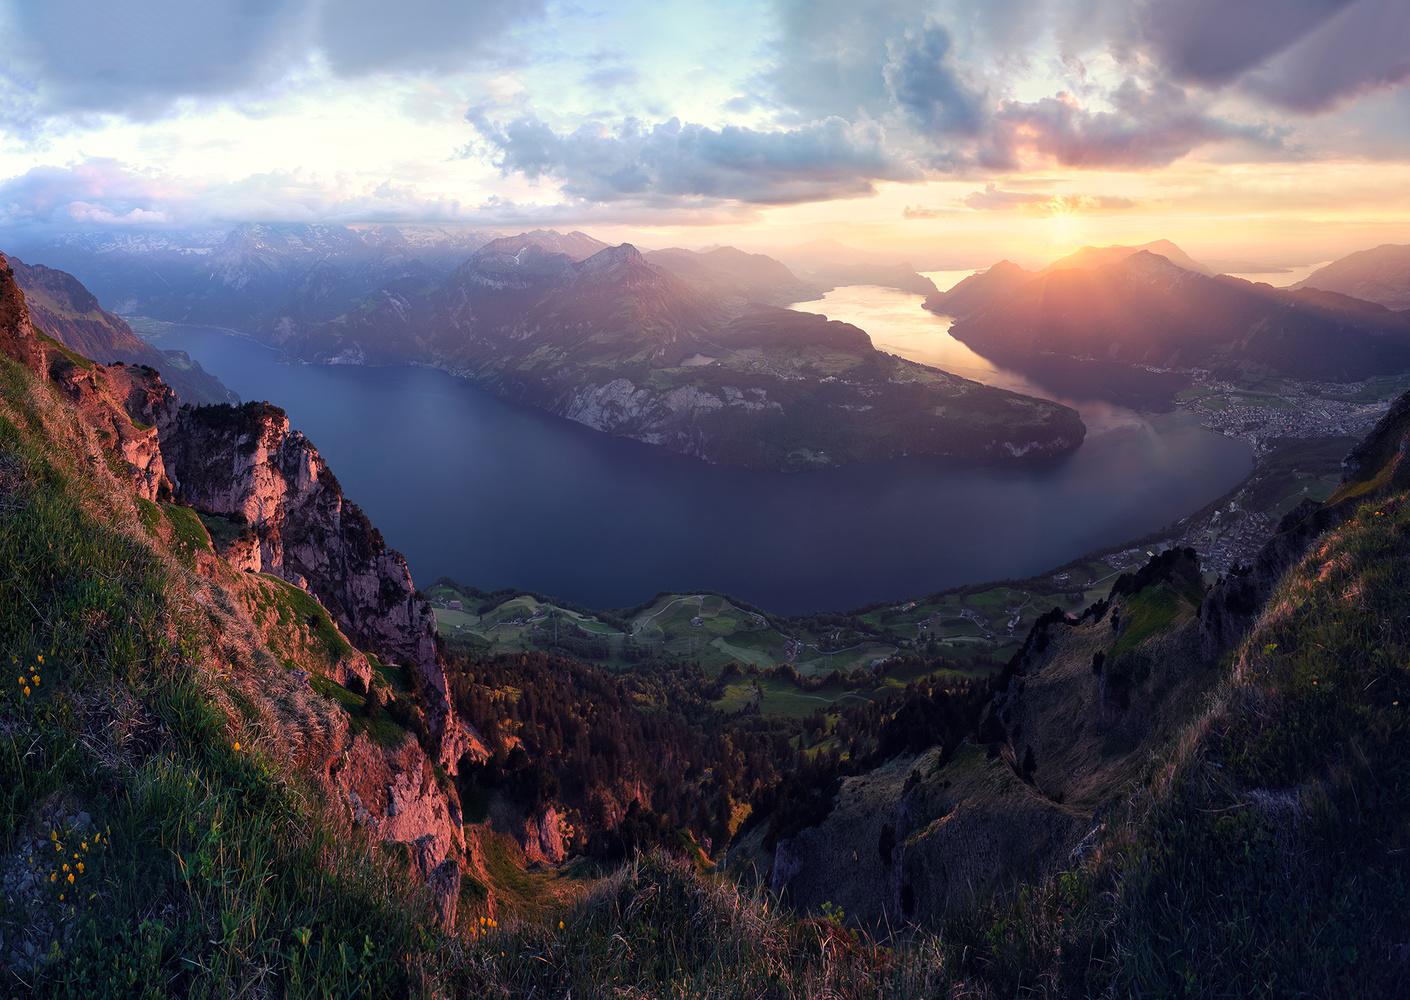 Fjord of switzerland by Lionel Fellay